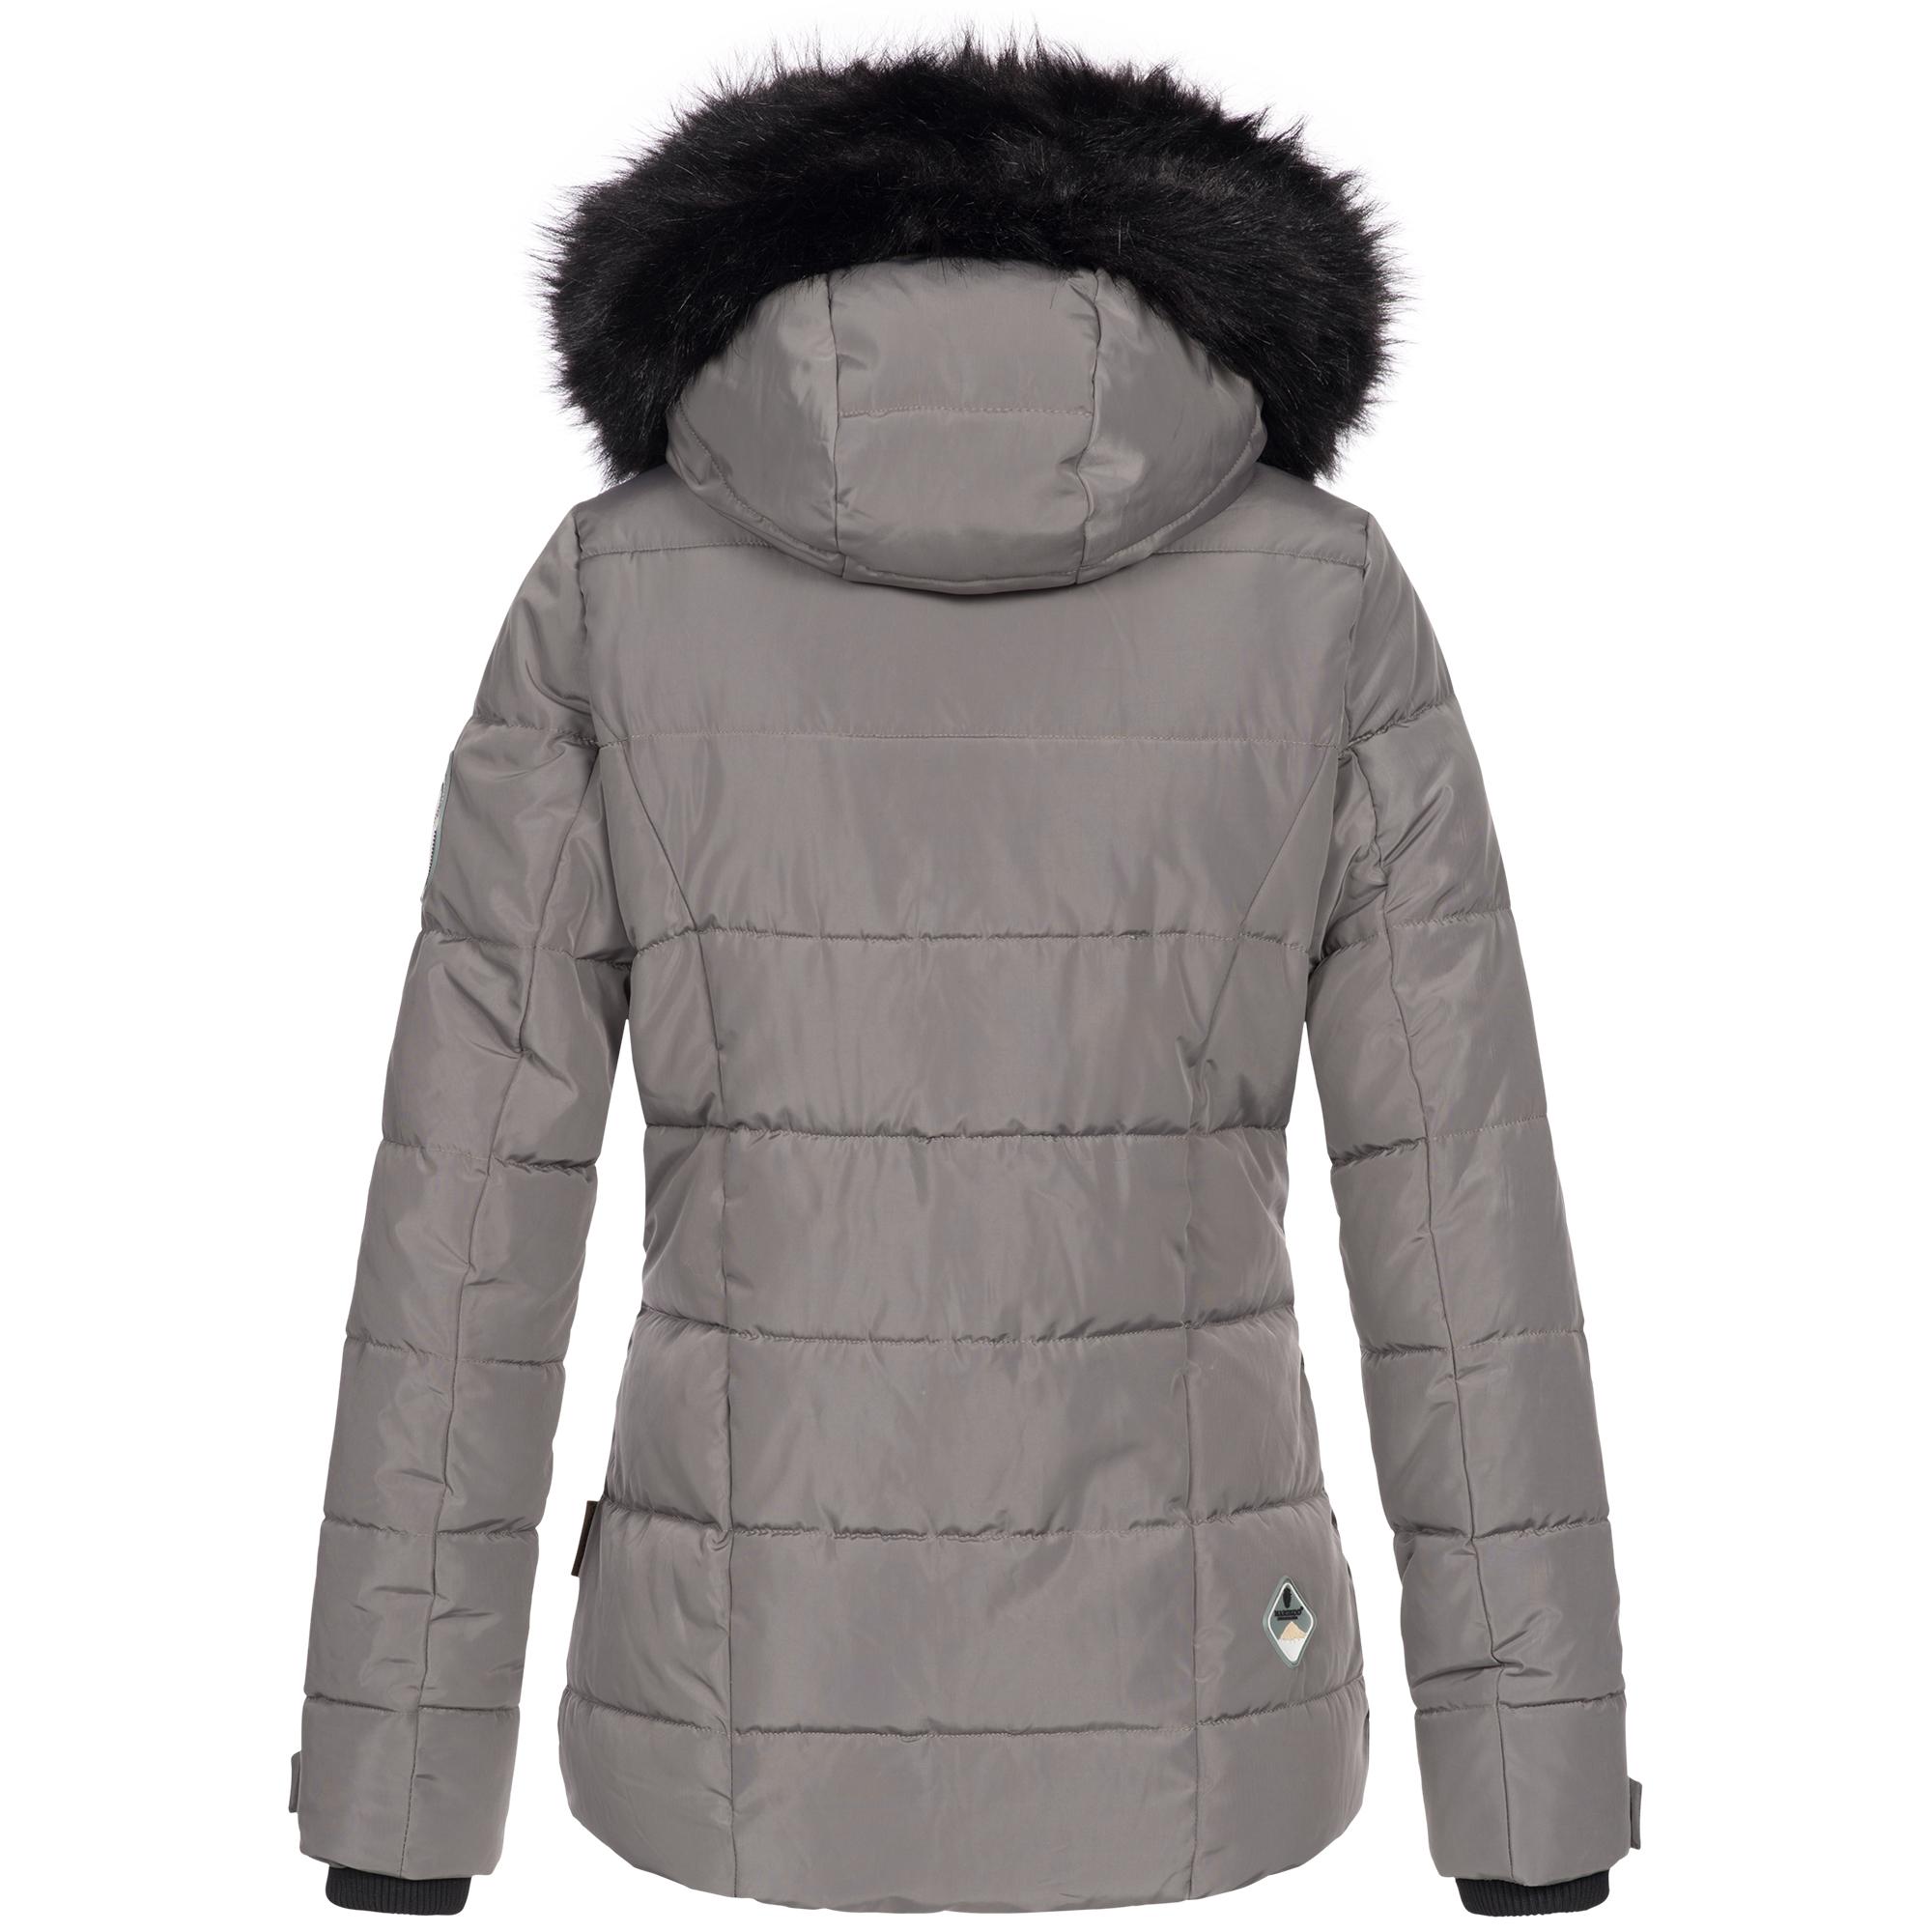 Marikoo Damen Winterjacke Jacke Winter Parka Ourdoor Ski warm Kapuze Snowgirl XS XXL 7 Farben